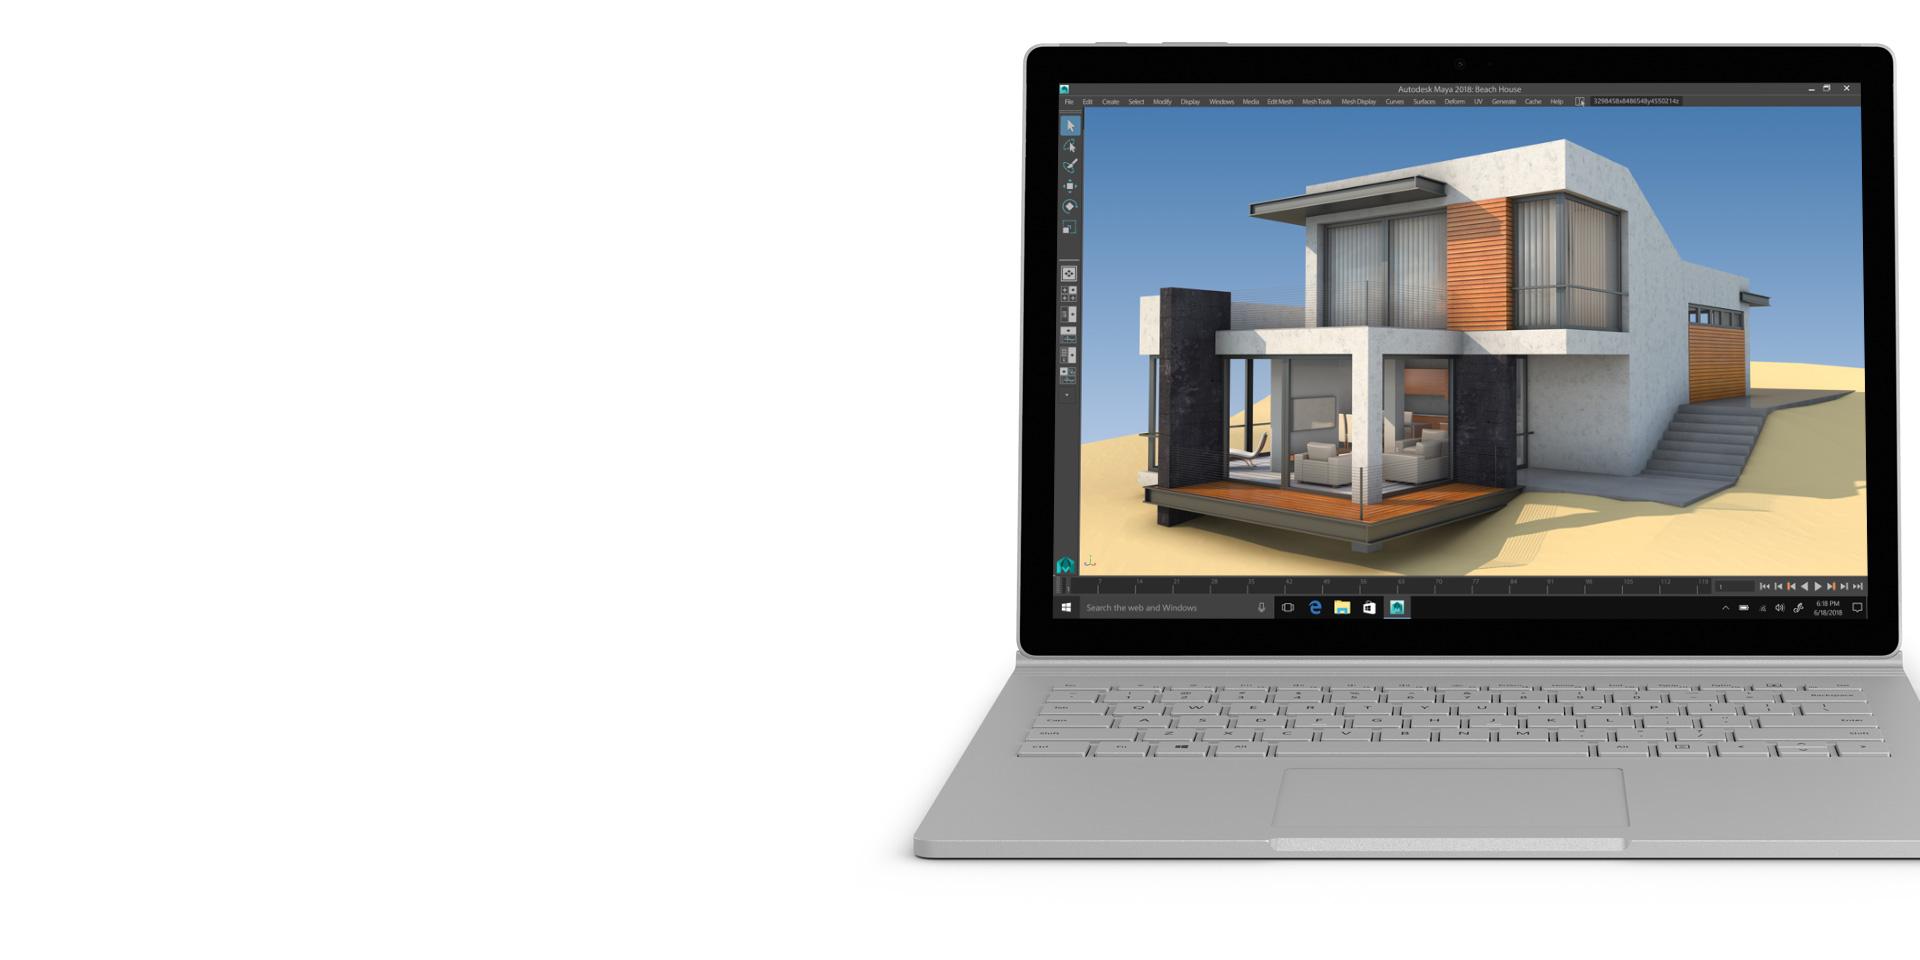 Autodesk Maya sullo schermo di un dispositivo Surface Book 2